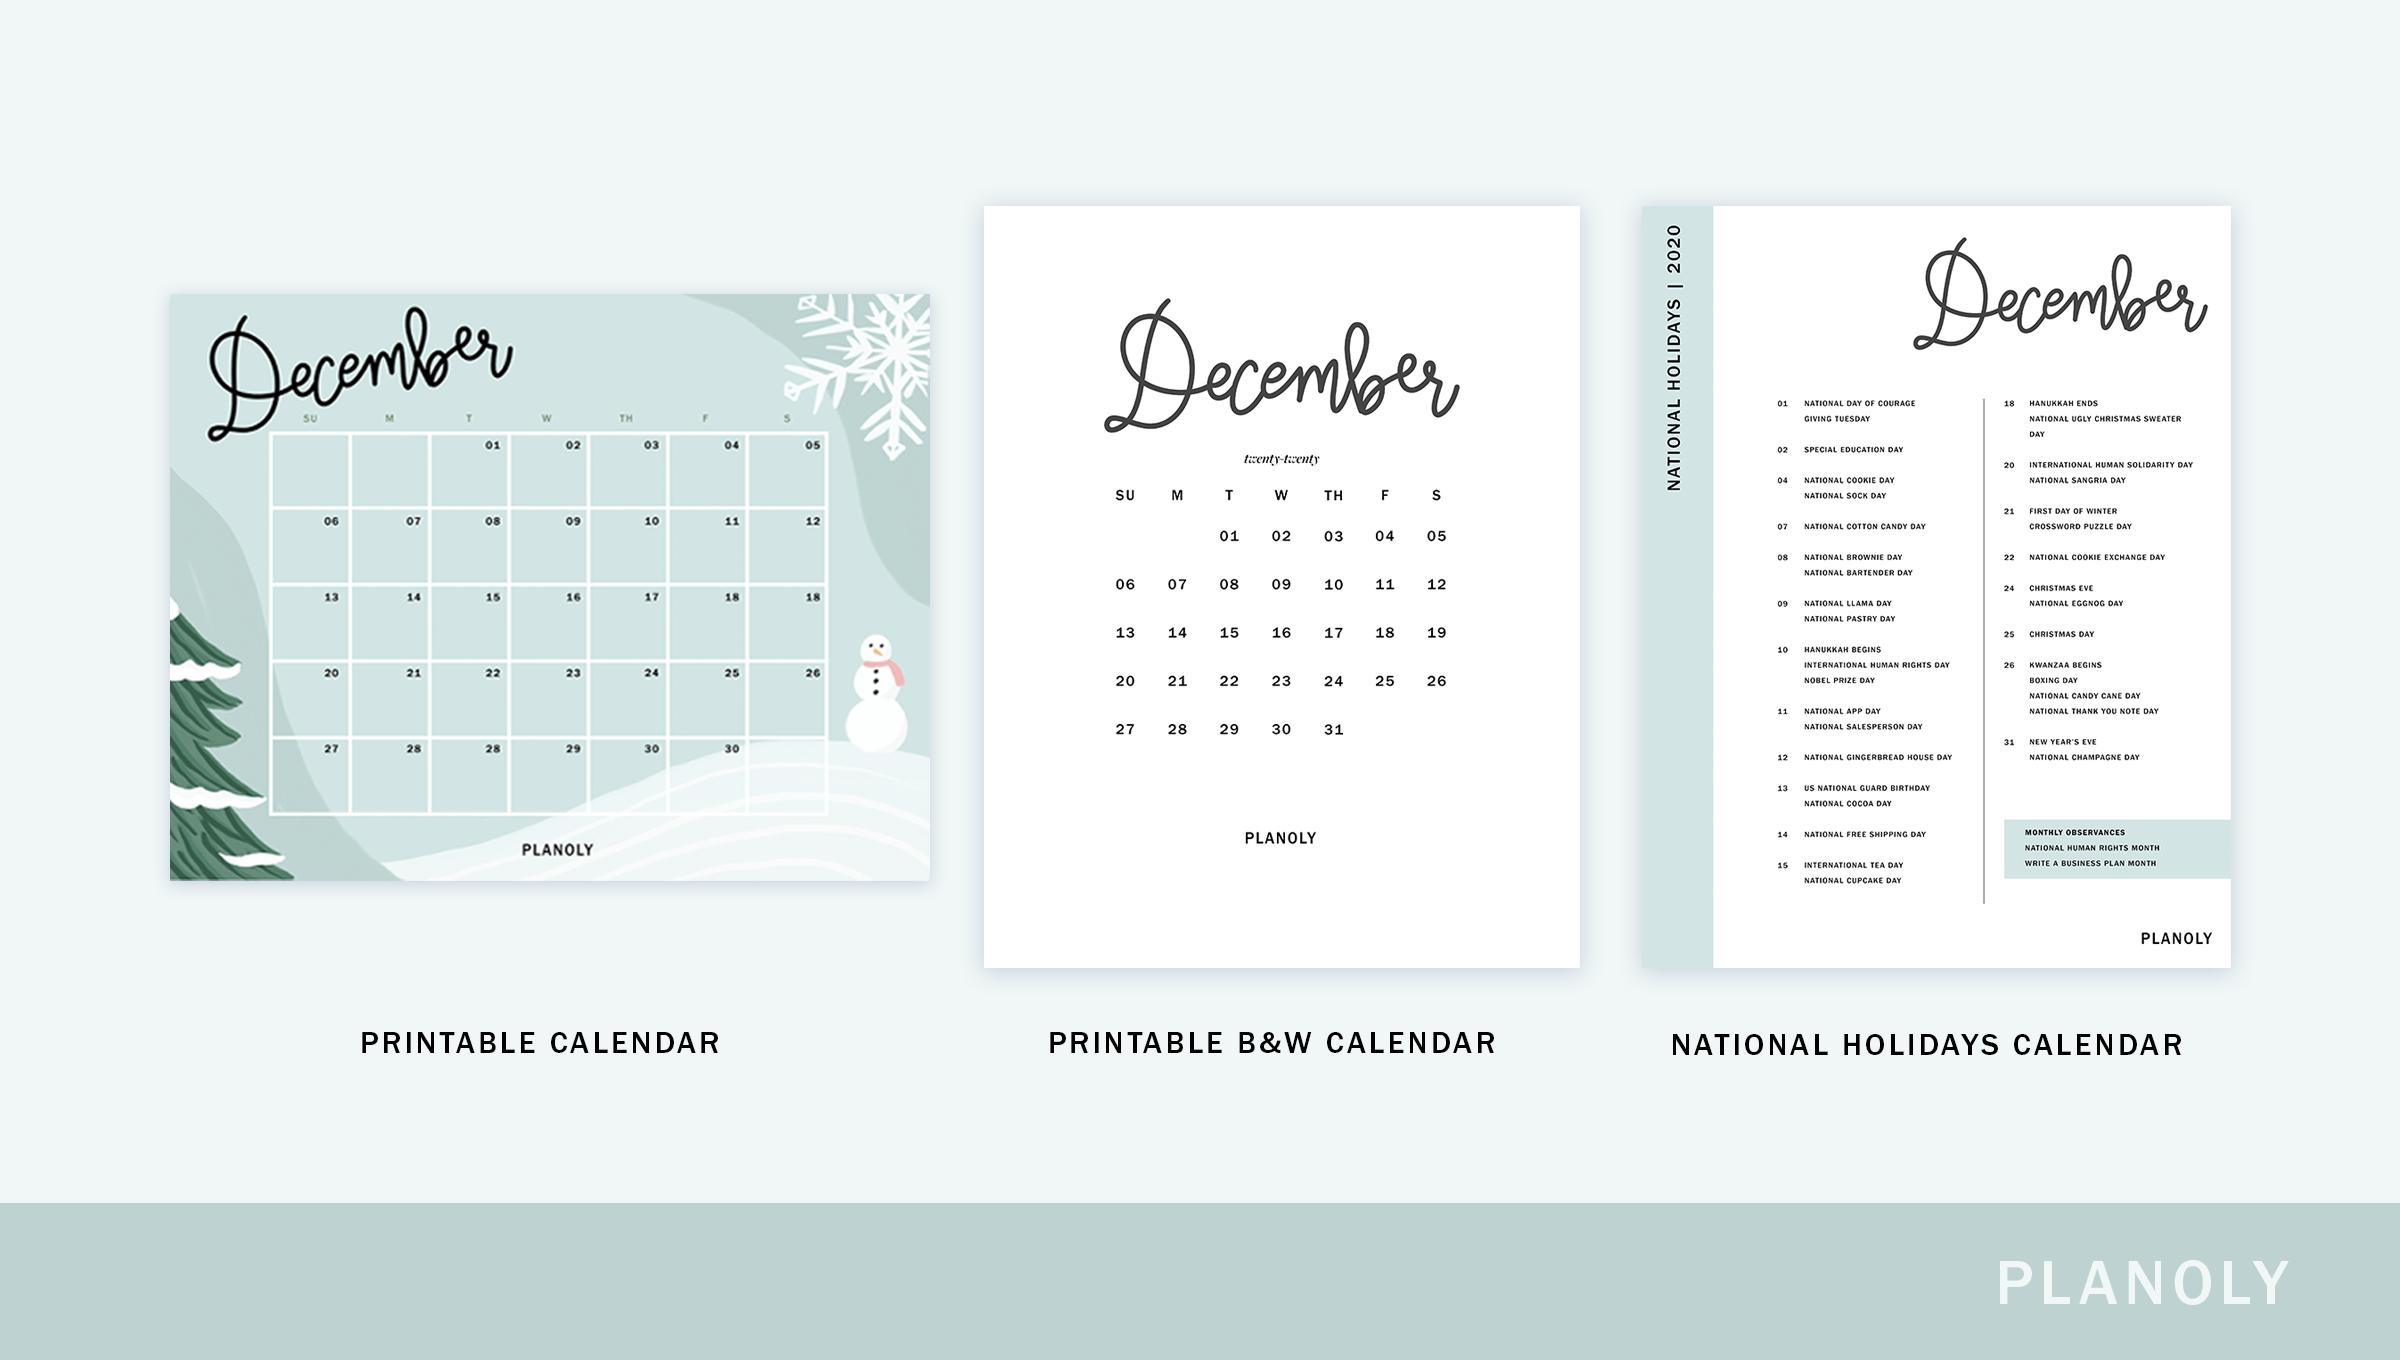 PLANOLY-blog post-Q4 2020 Content Calendars - Image 6